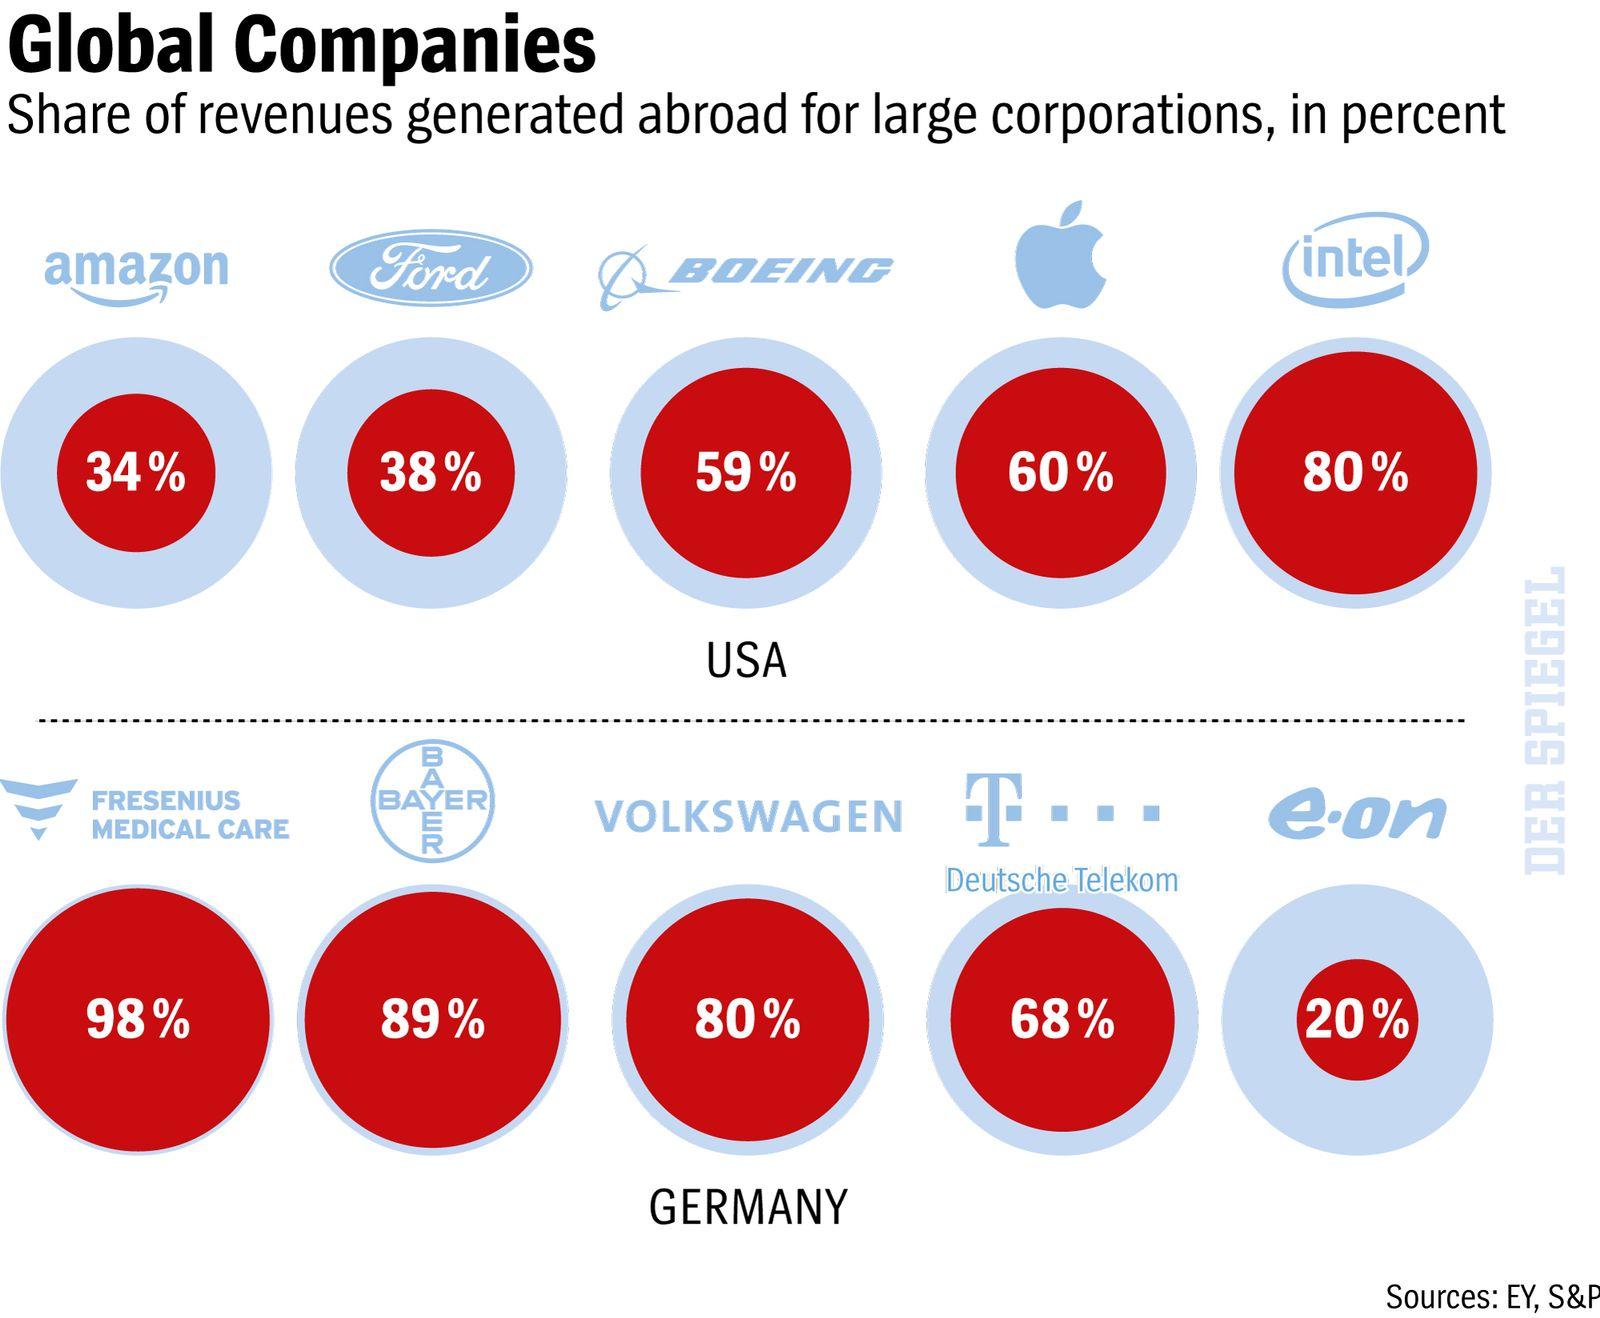 DER SPIEGEL 05 EN Global Companies